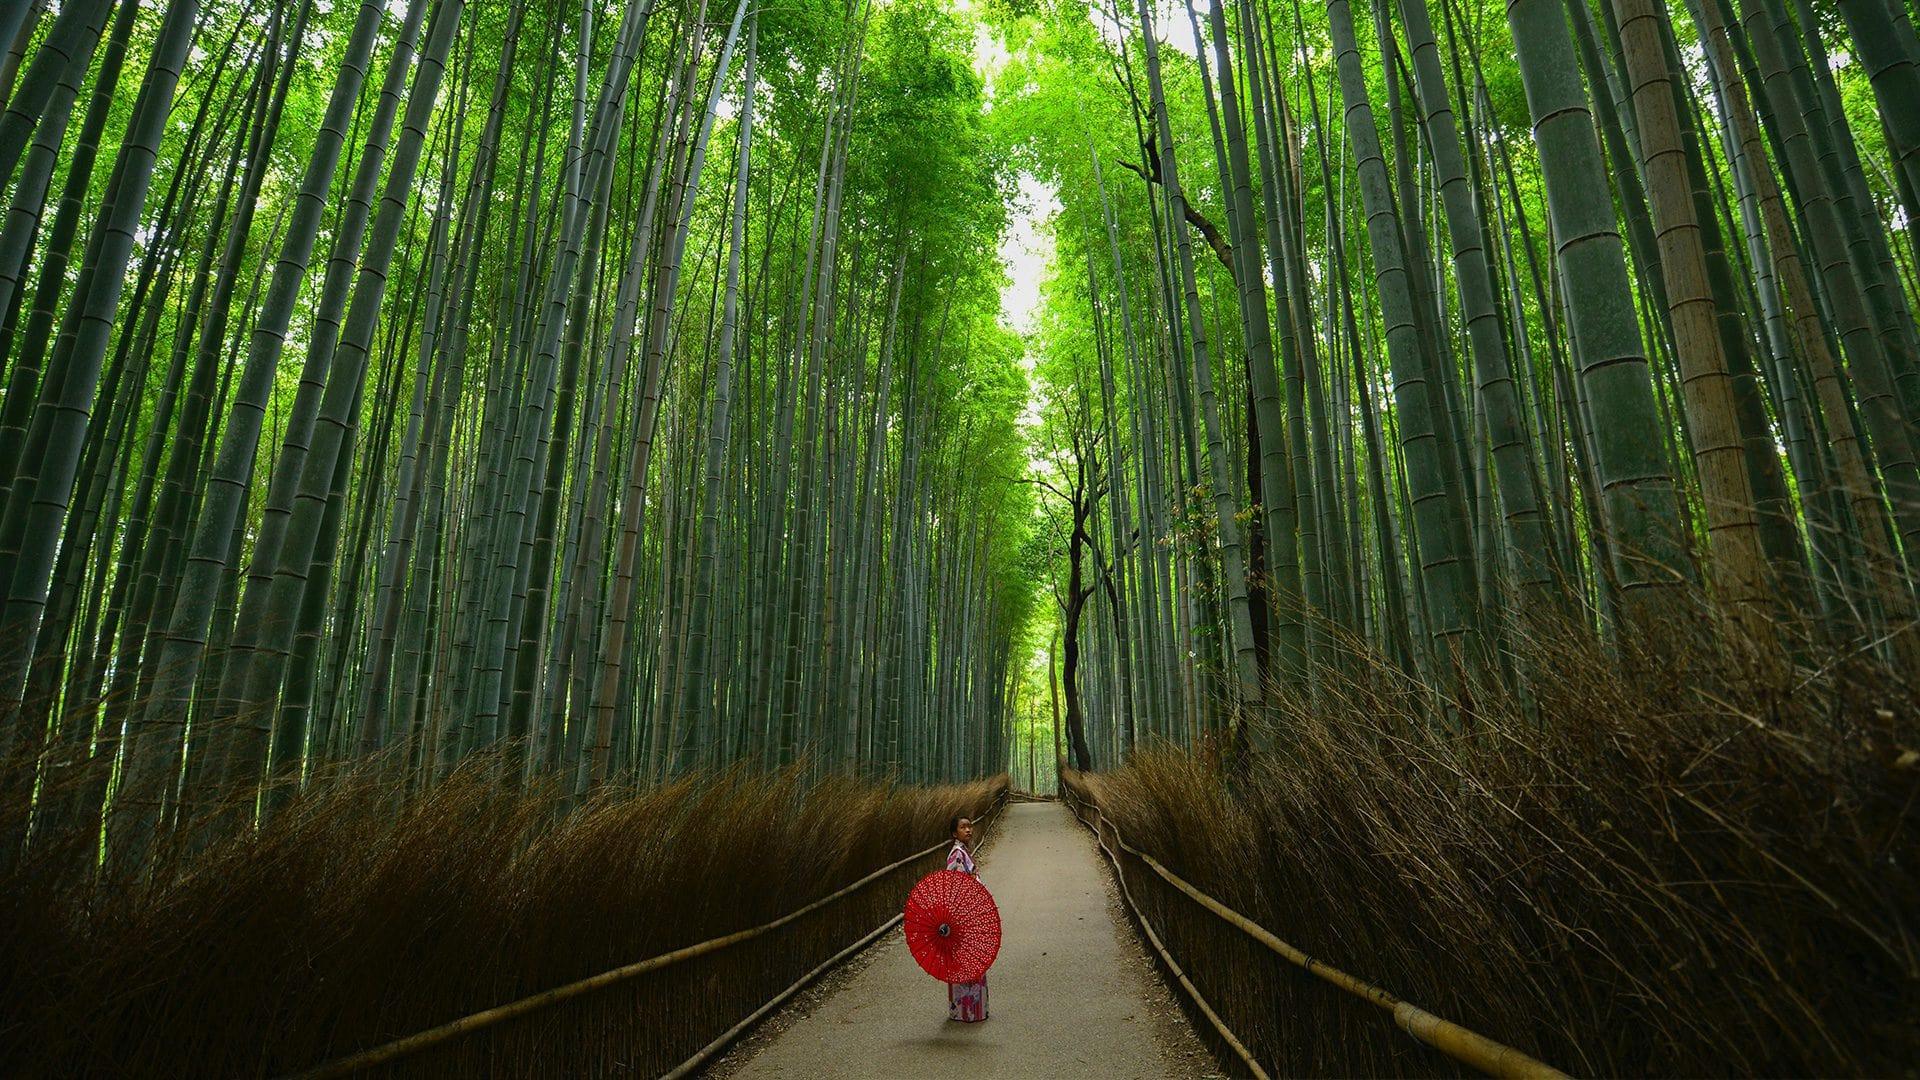 Entrevista Wander on World | Rojo Cangrejo Blog de Viajes